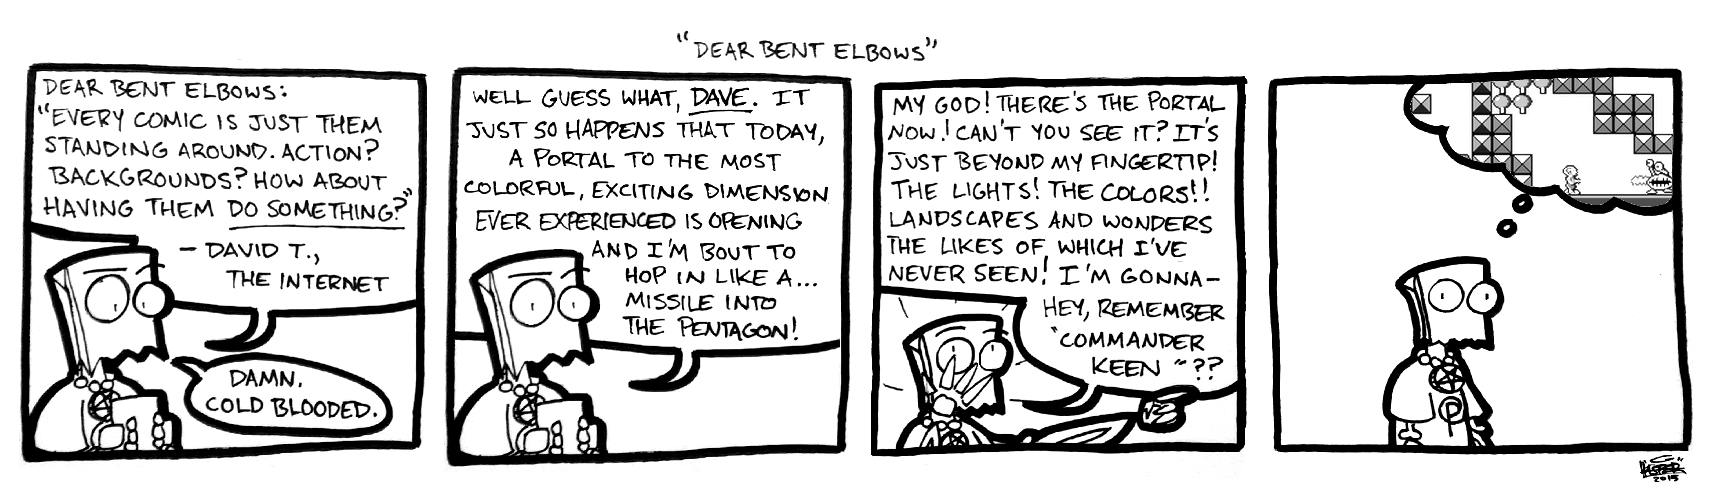 Mail: Dear Bent Elbows